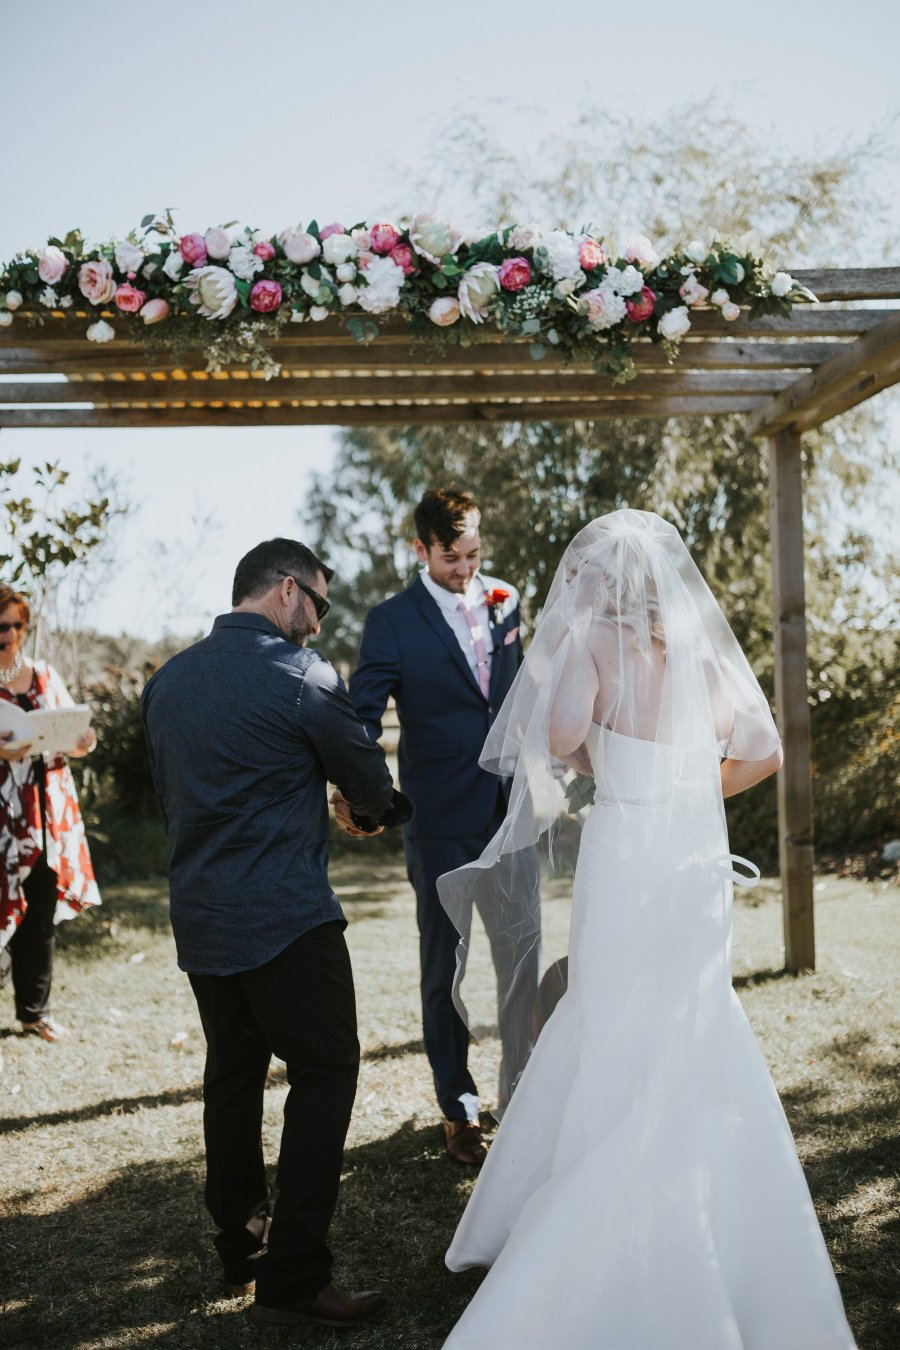 Perth Wedding Photographer   Ebony Blush Photography   Zoe Theiadore   K+T432